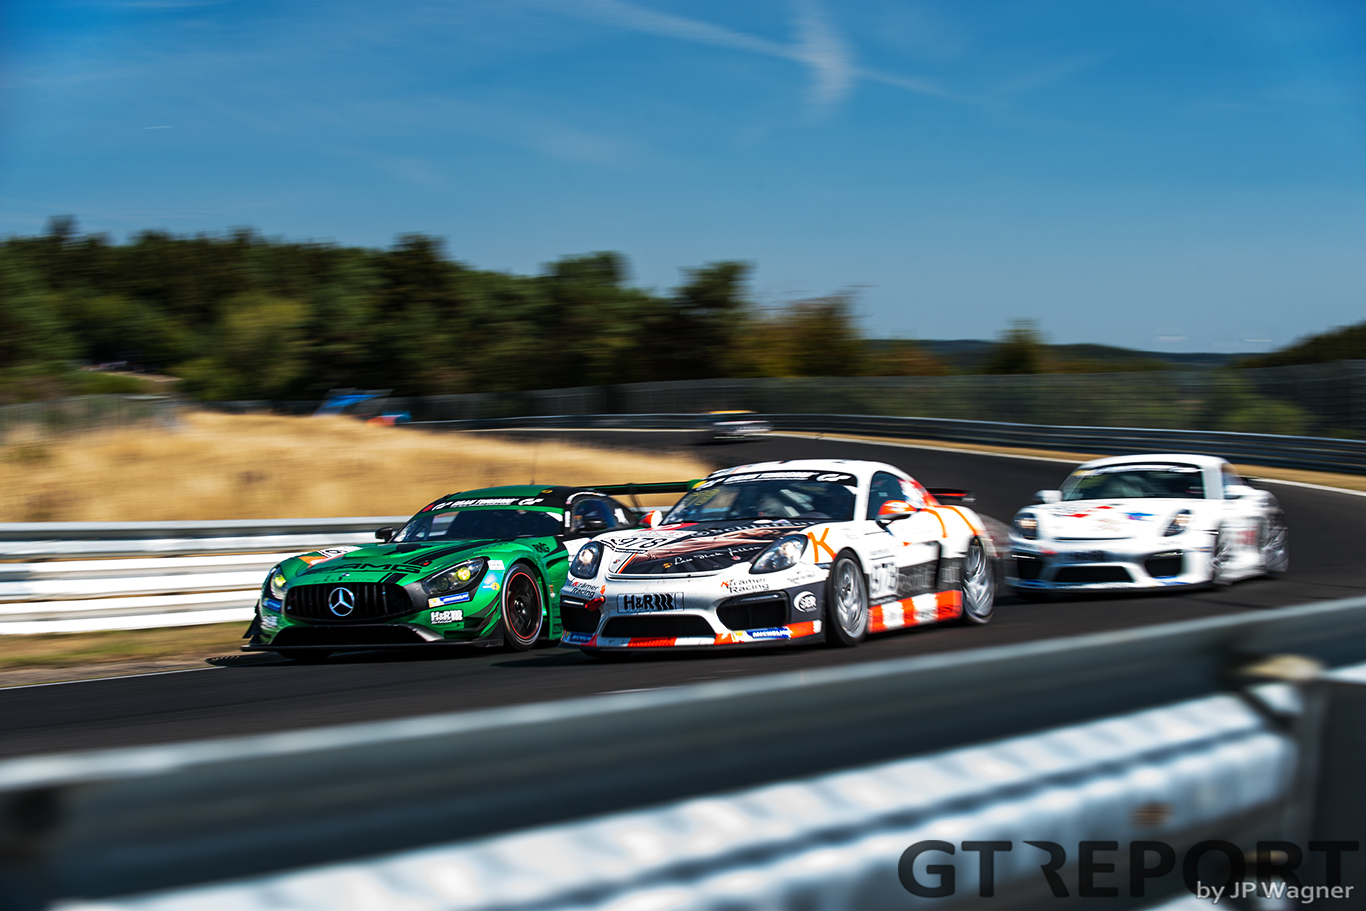 VLN5 race report: Green machine